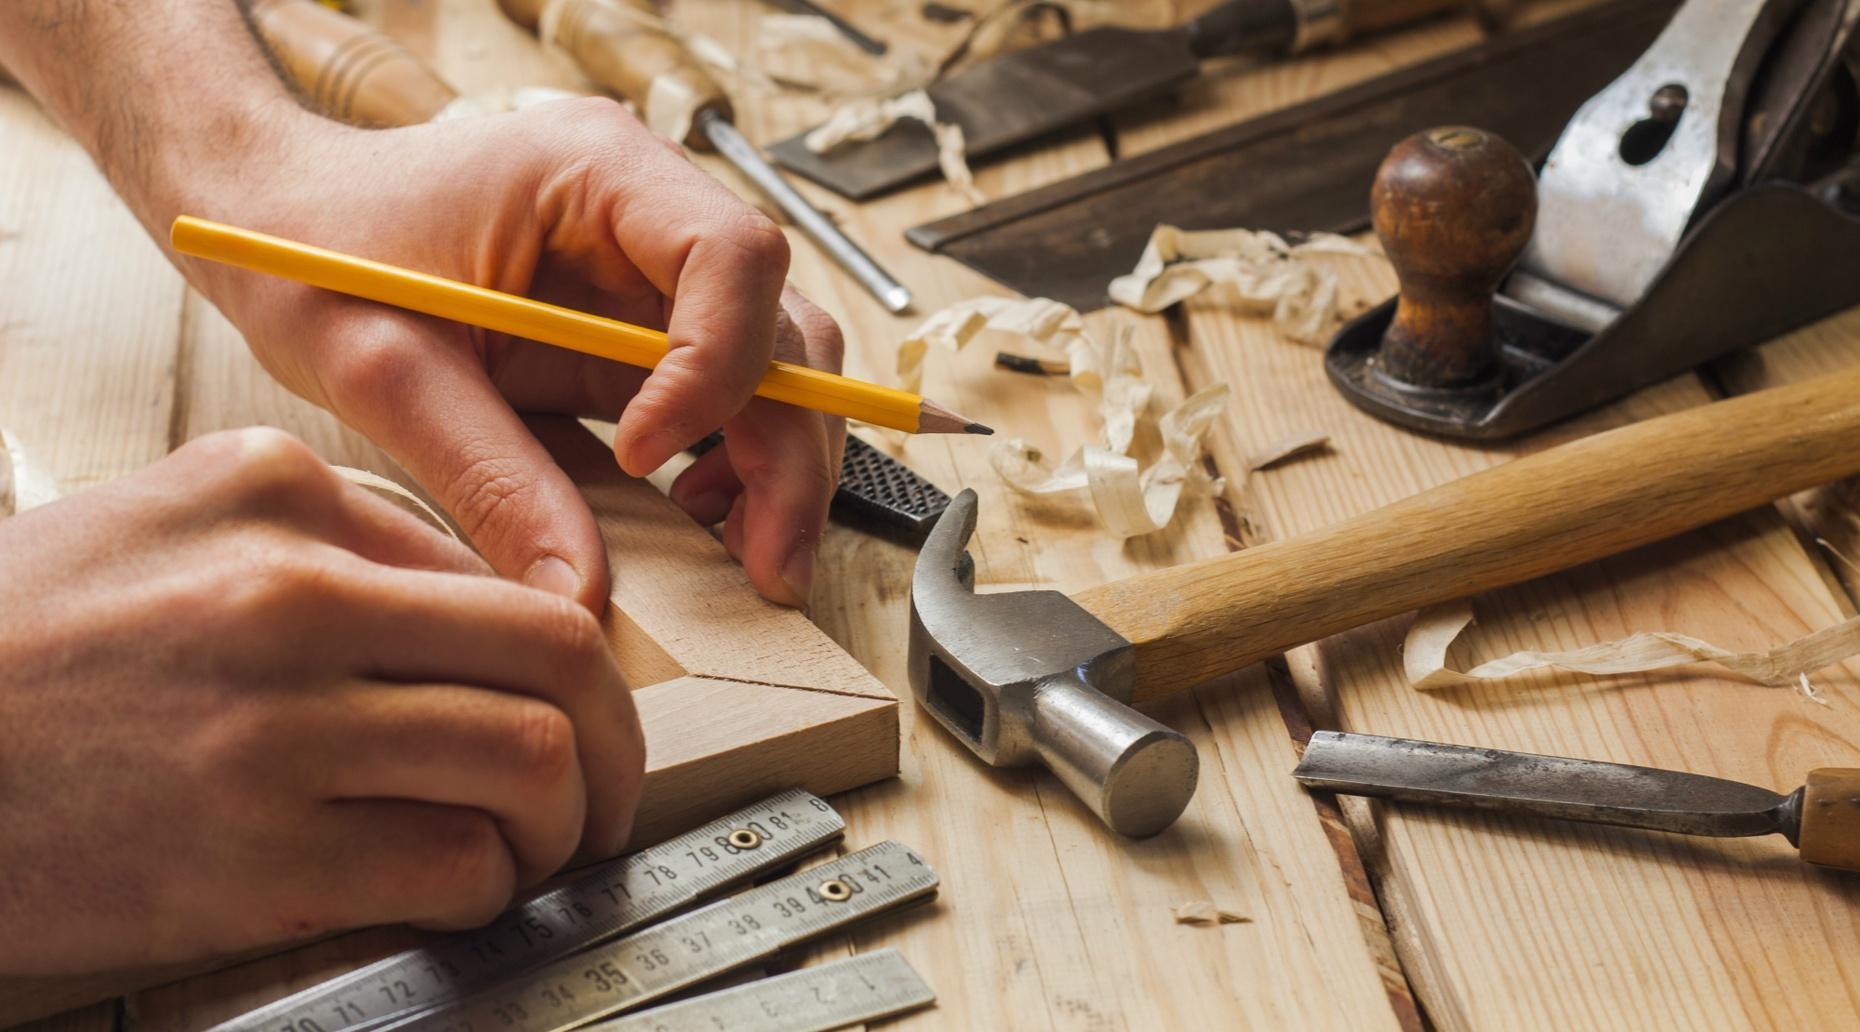 Wood Project Workshop: Book Tours & Activities at Peek.com